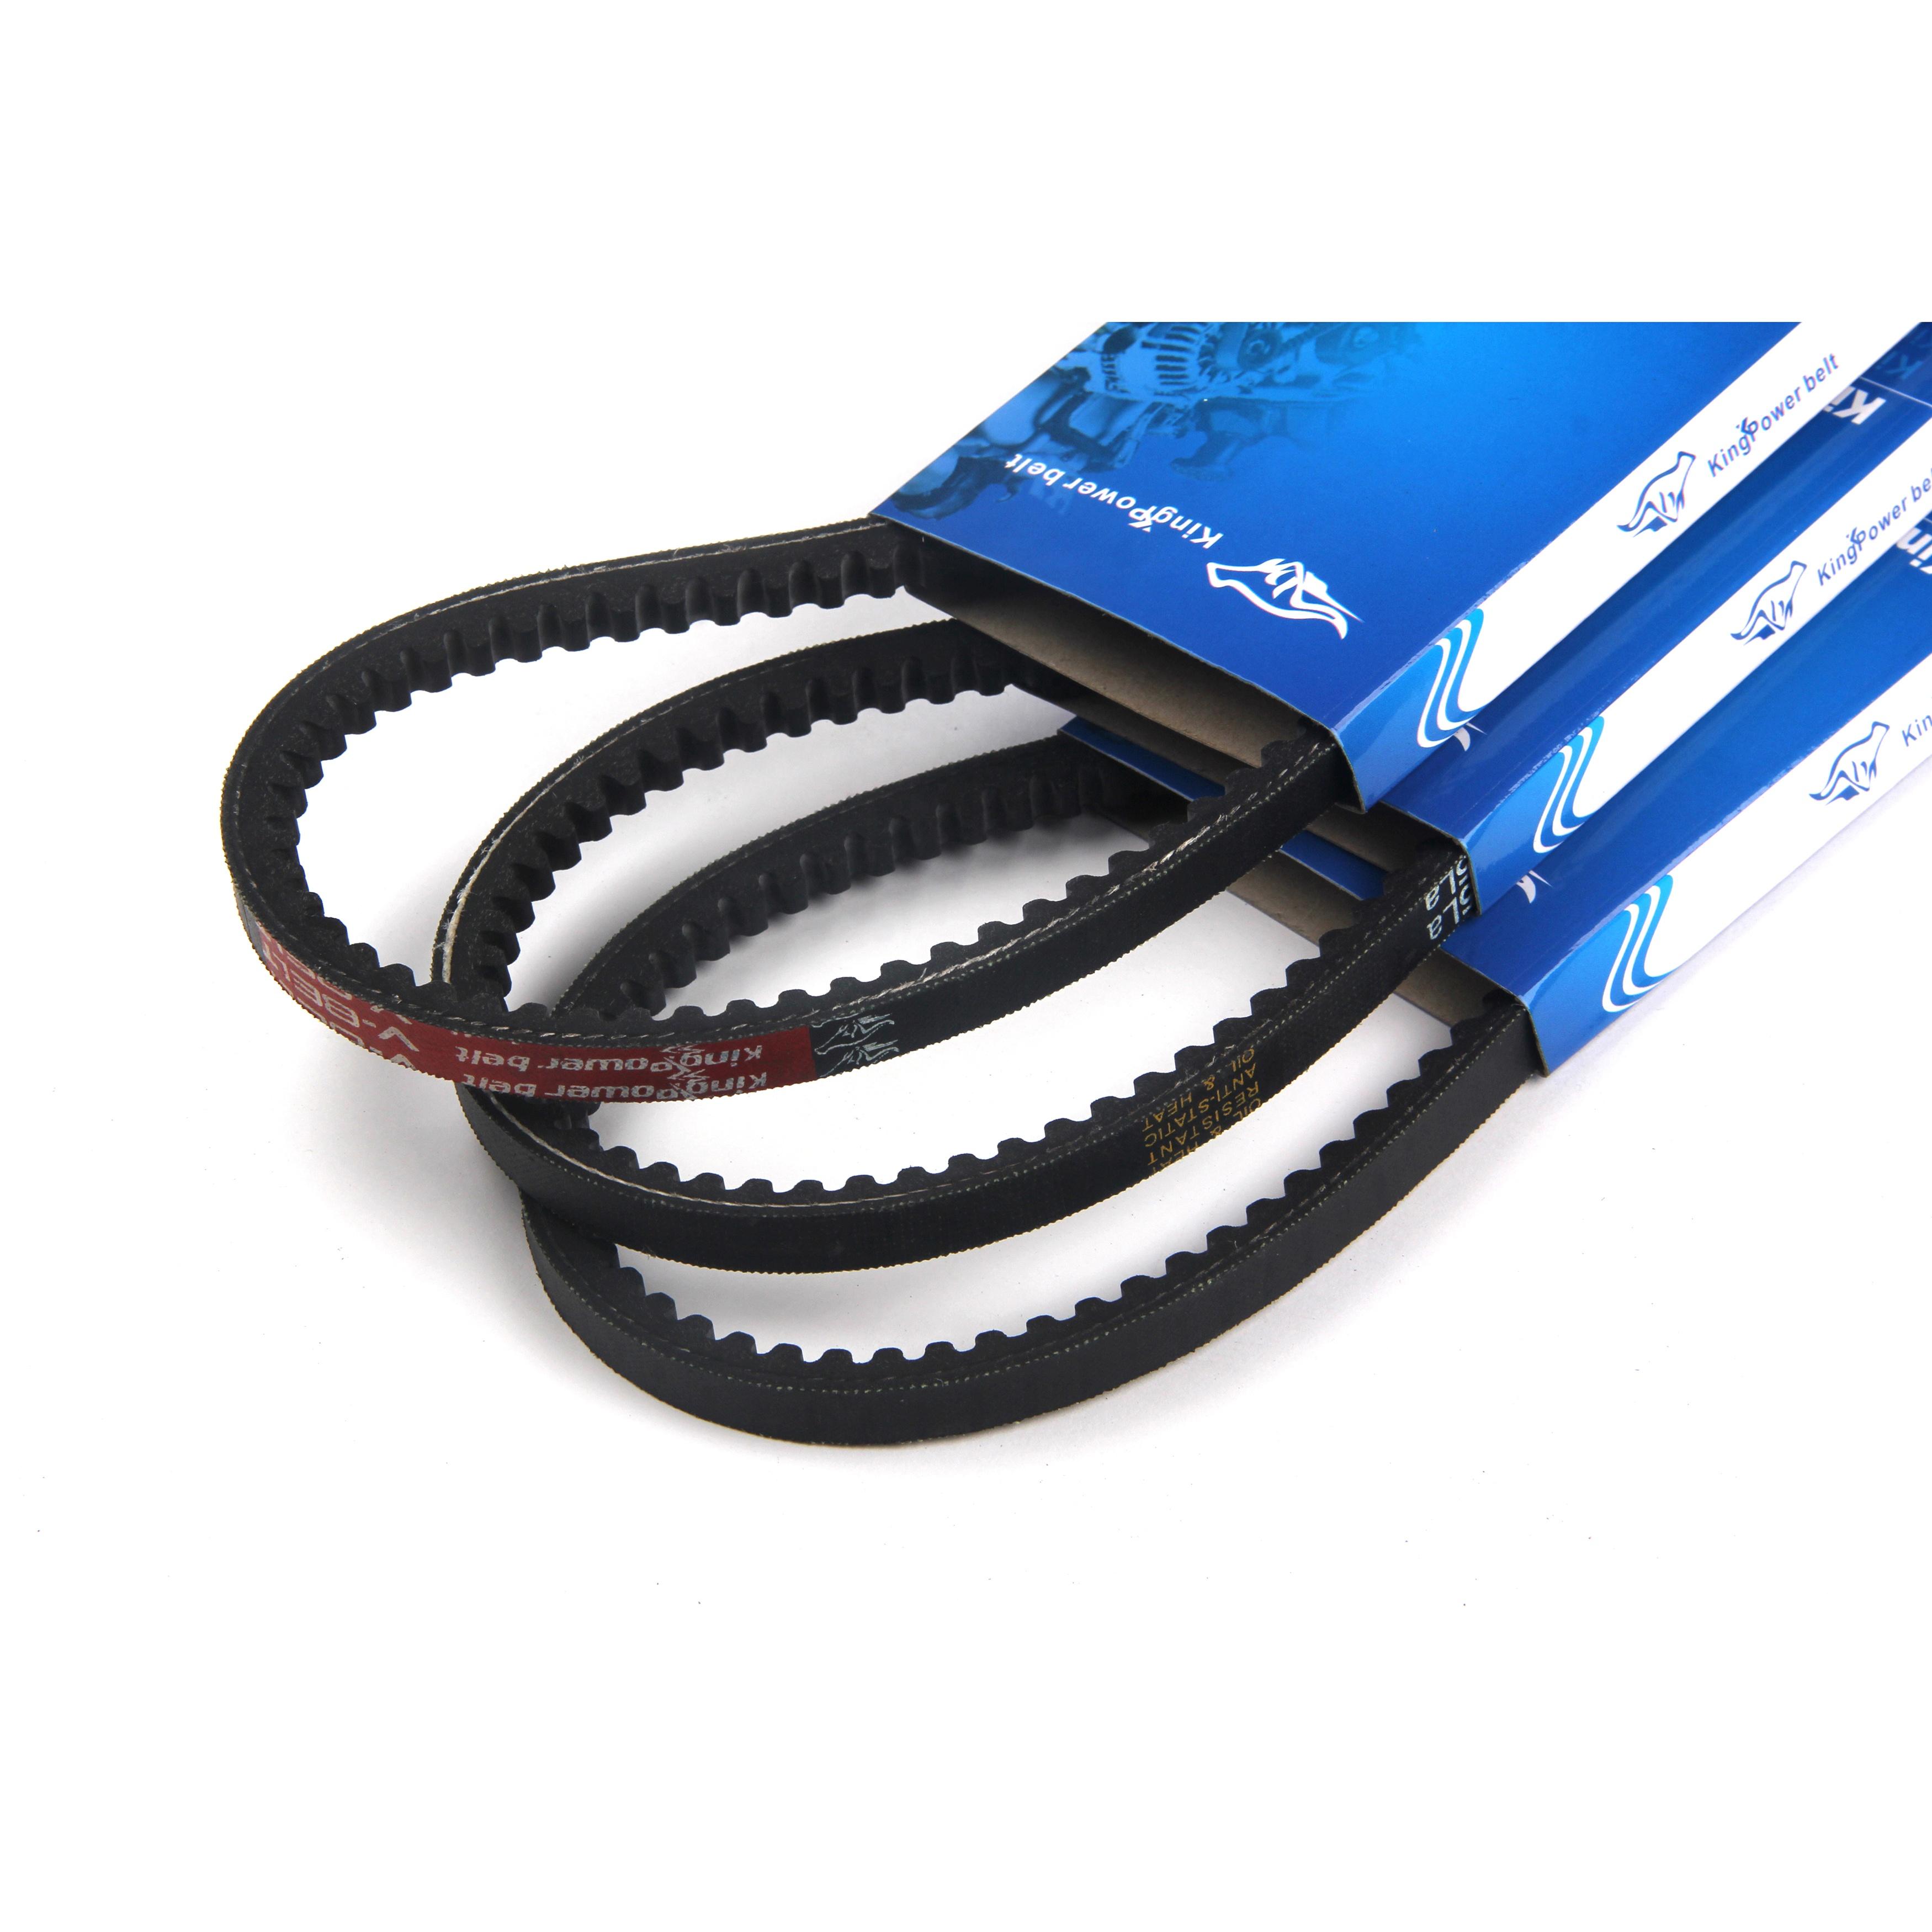 Automotive Transmission Belt car Rubber V Belts auto Mechanical Parts  Flat Belt